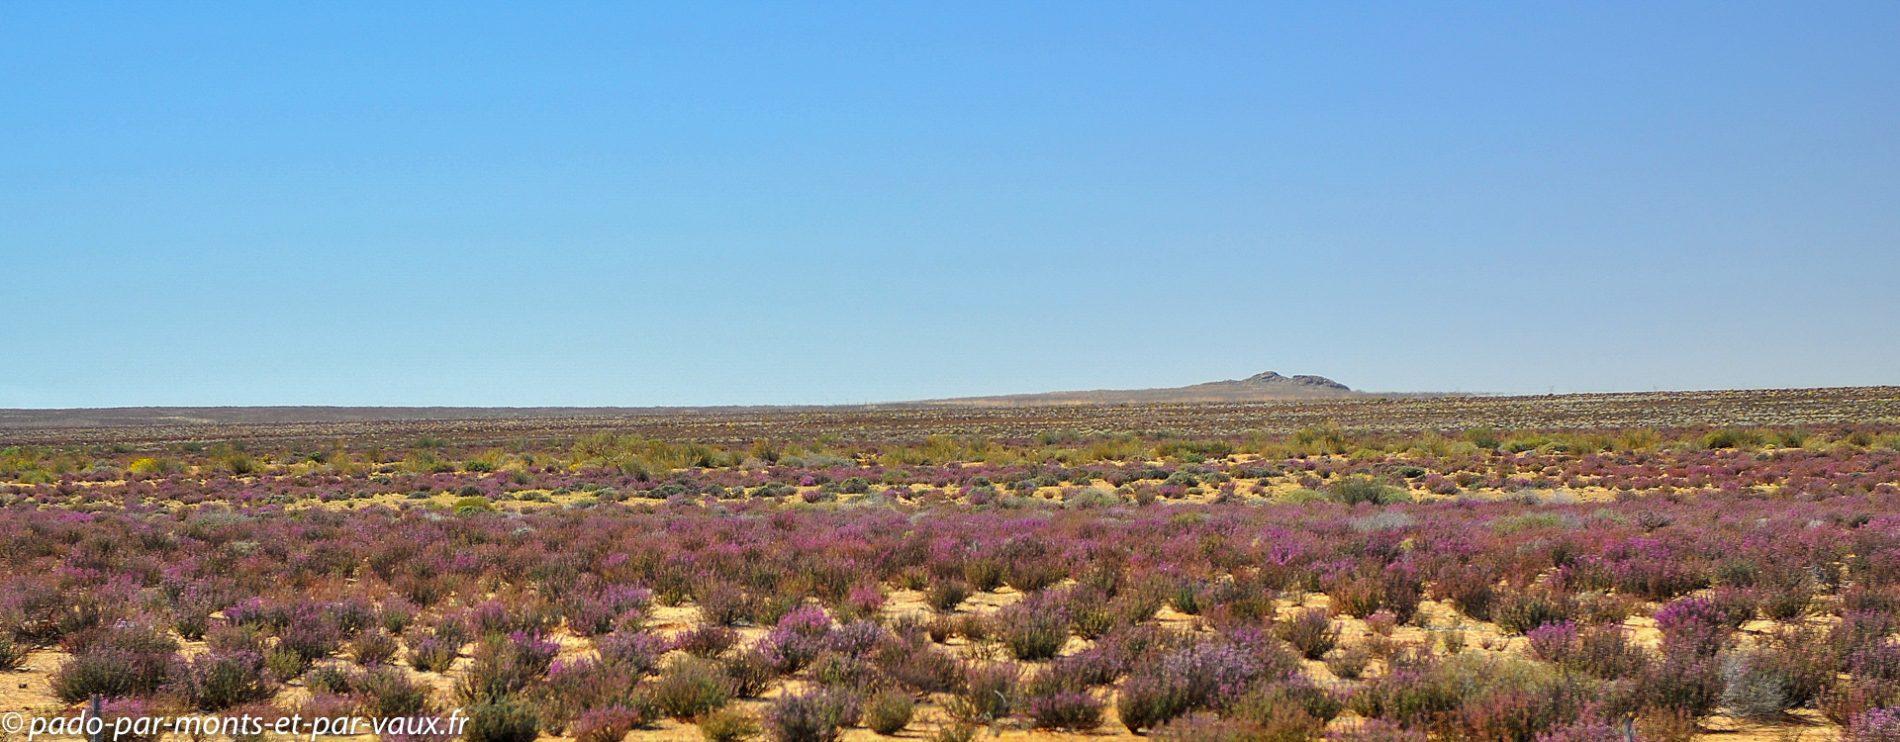 N7 en direction de la Namibie